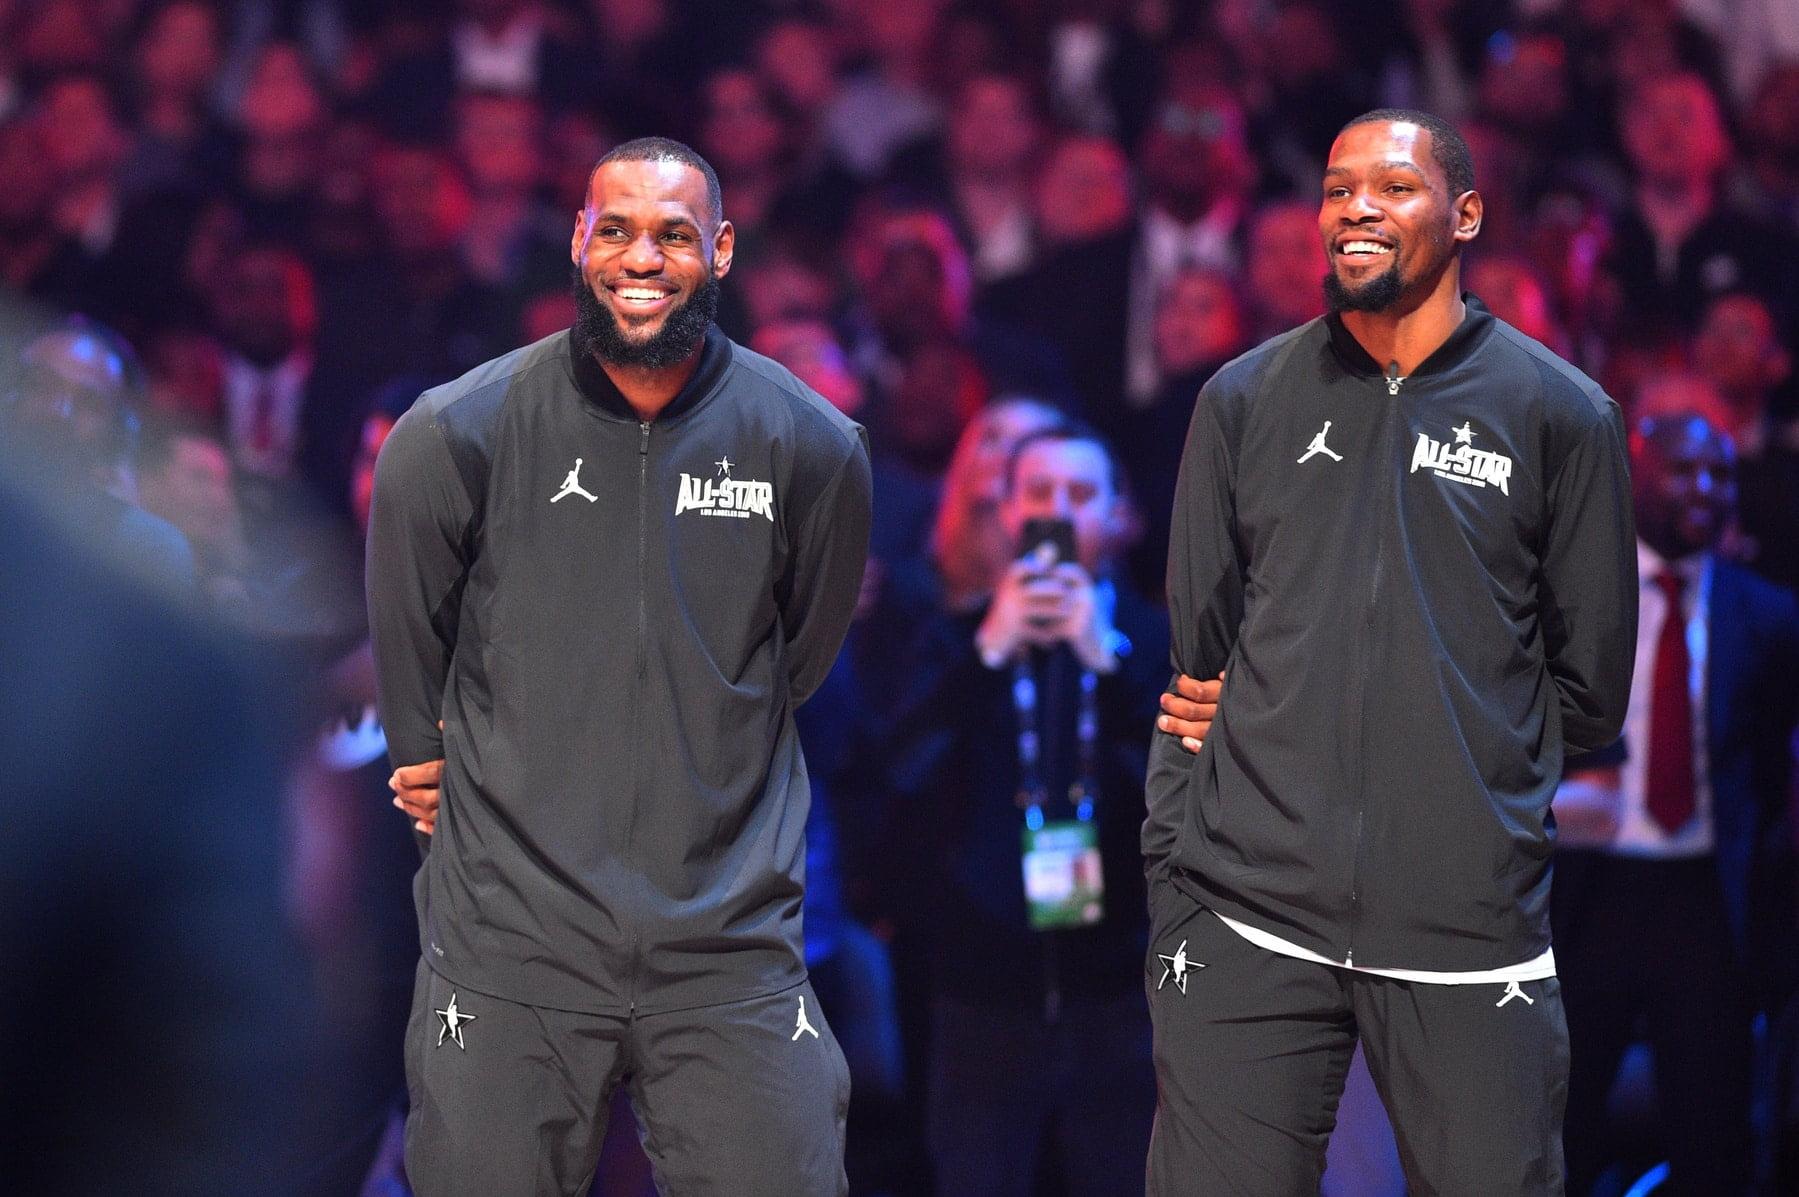 Stephen A. Smith: LeBron James has